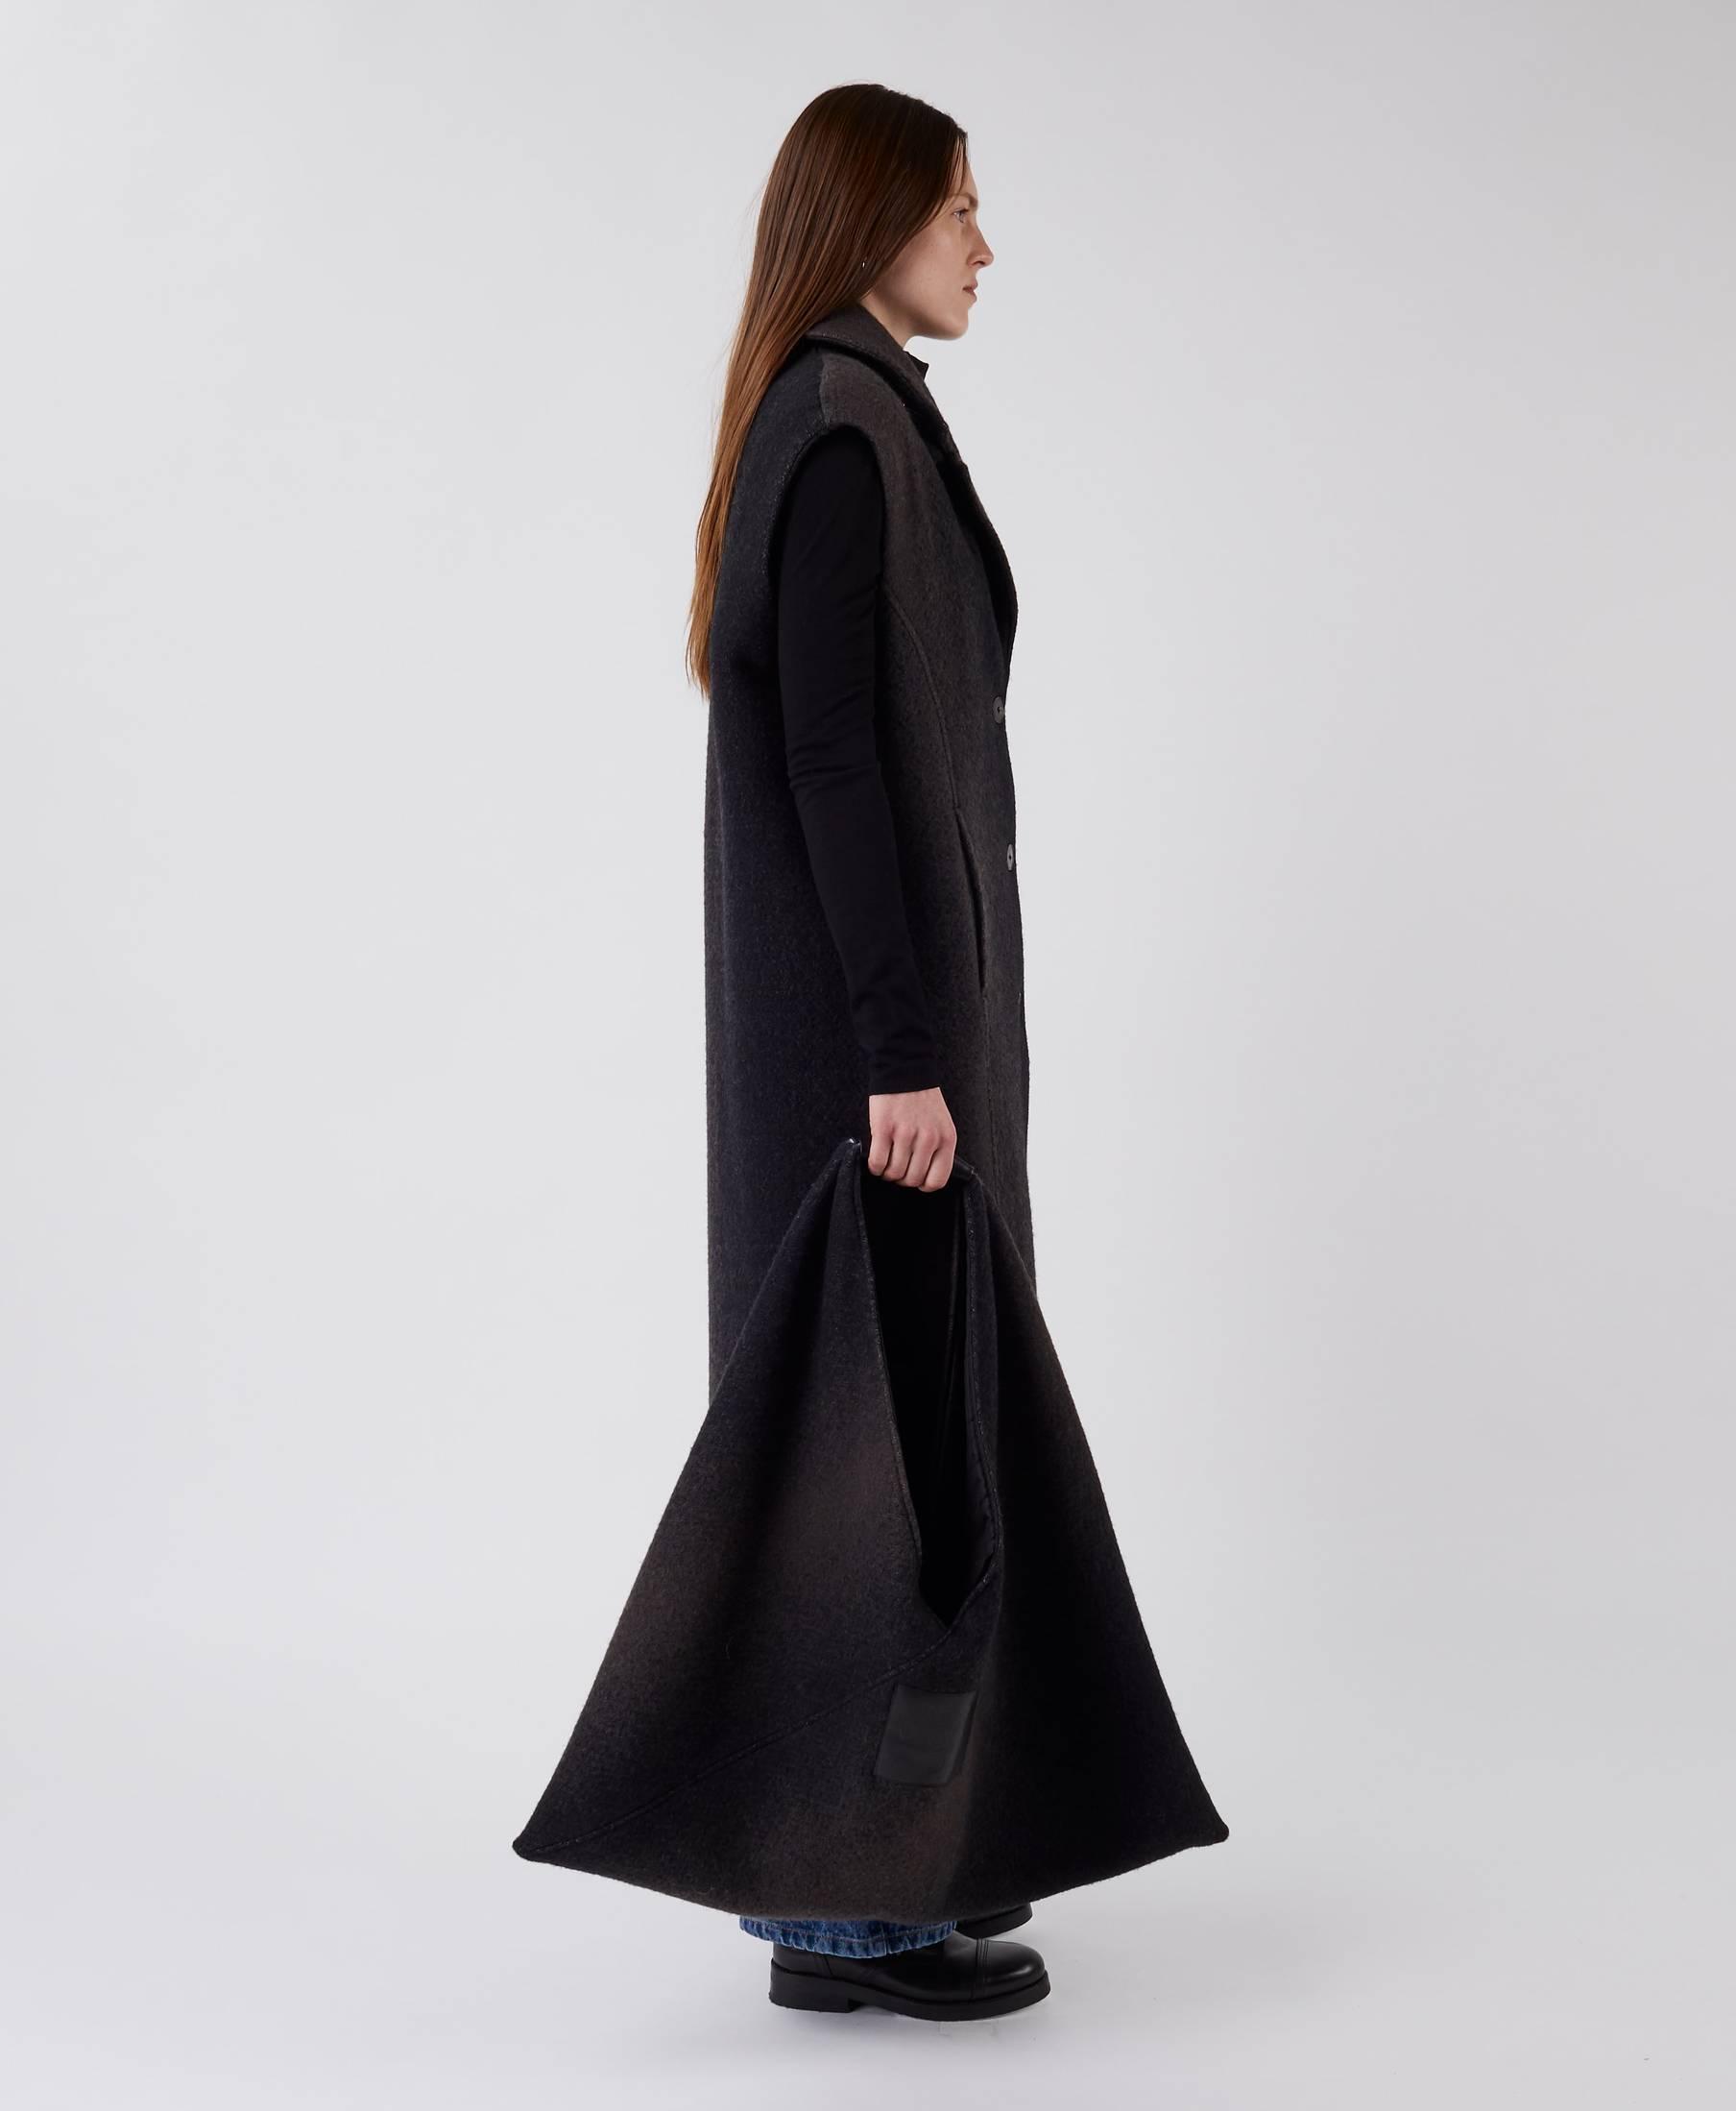 Triangle Bag Gradient Black